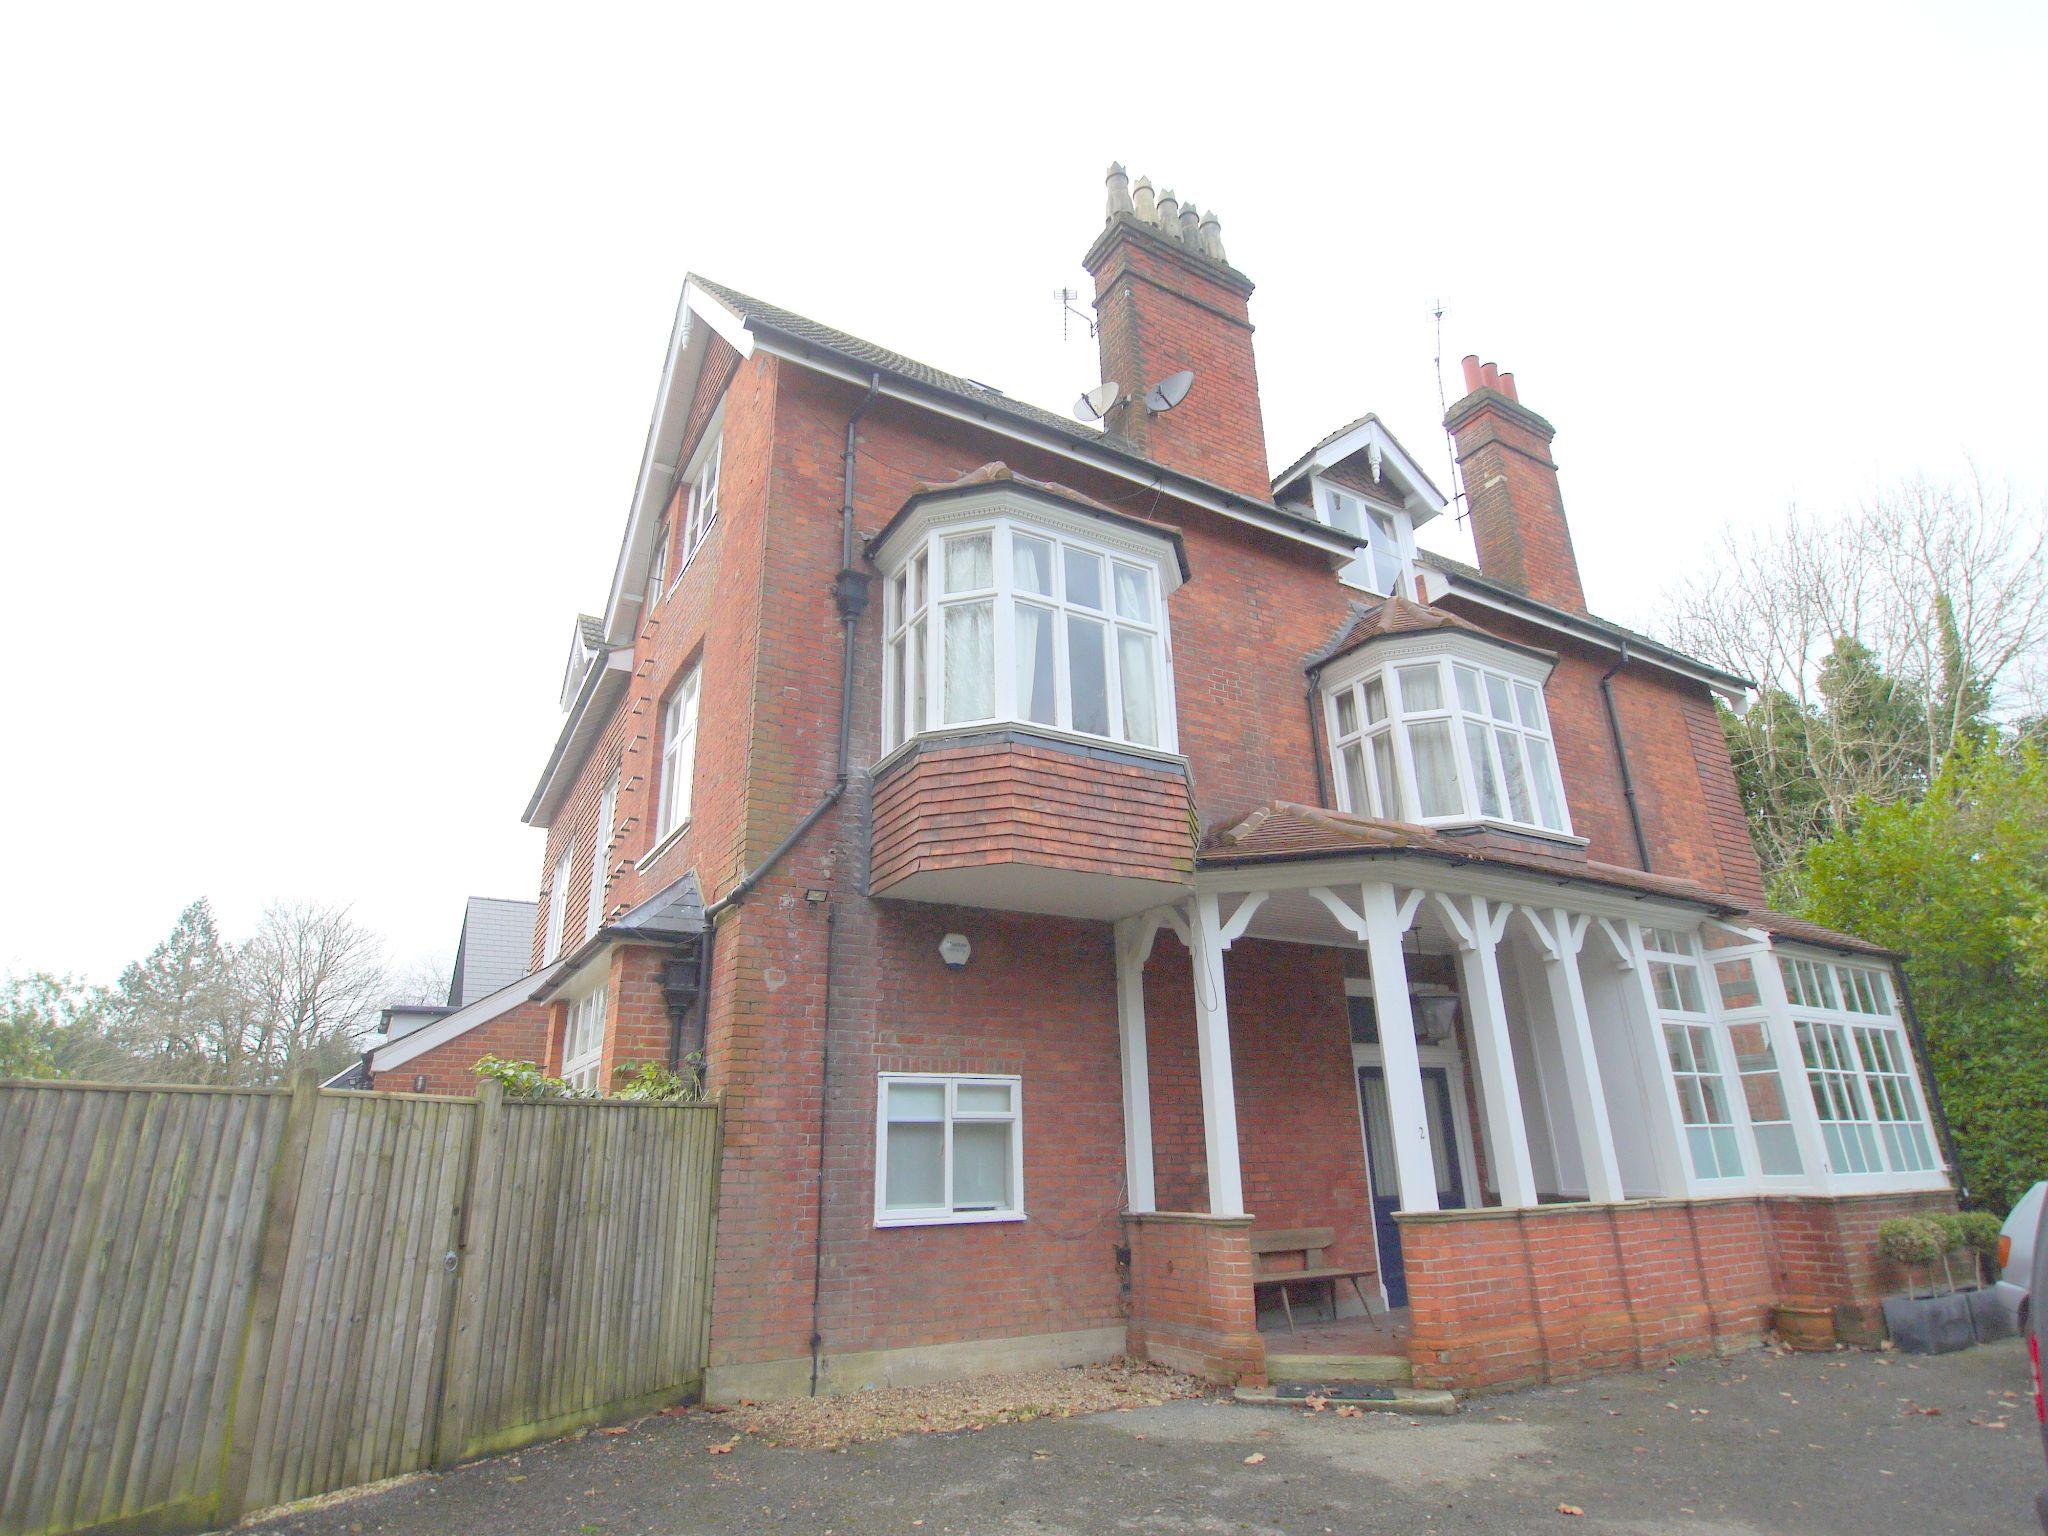 2 bedroom flat Sold in Sevenoaks - Photograph 1